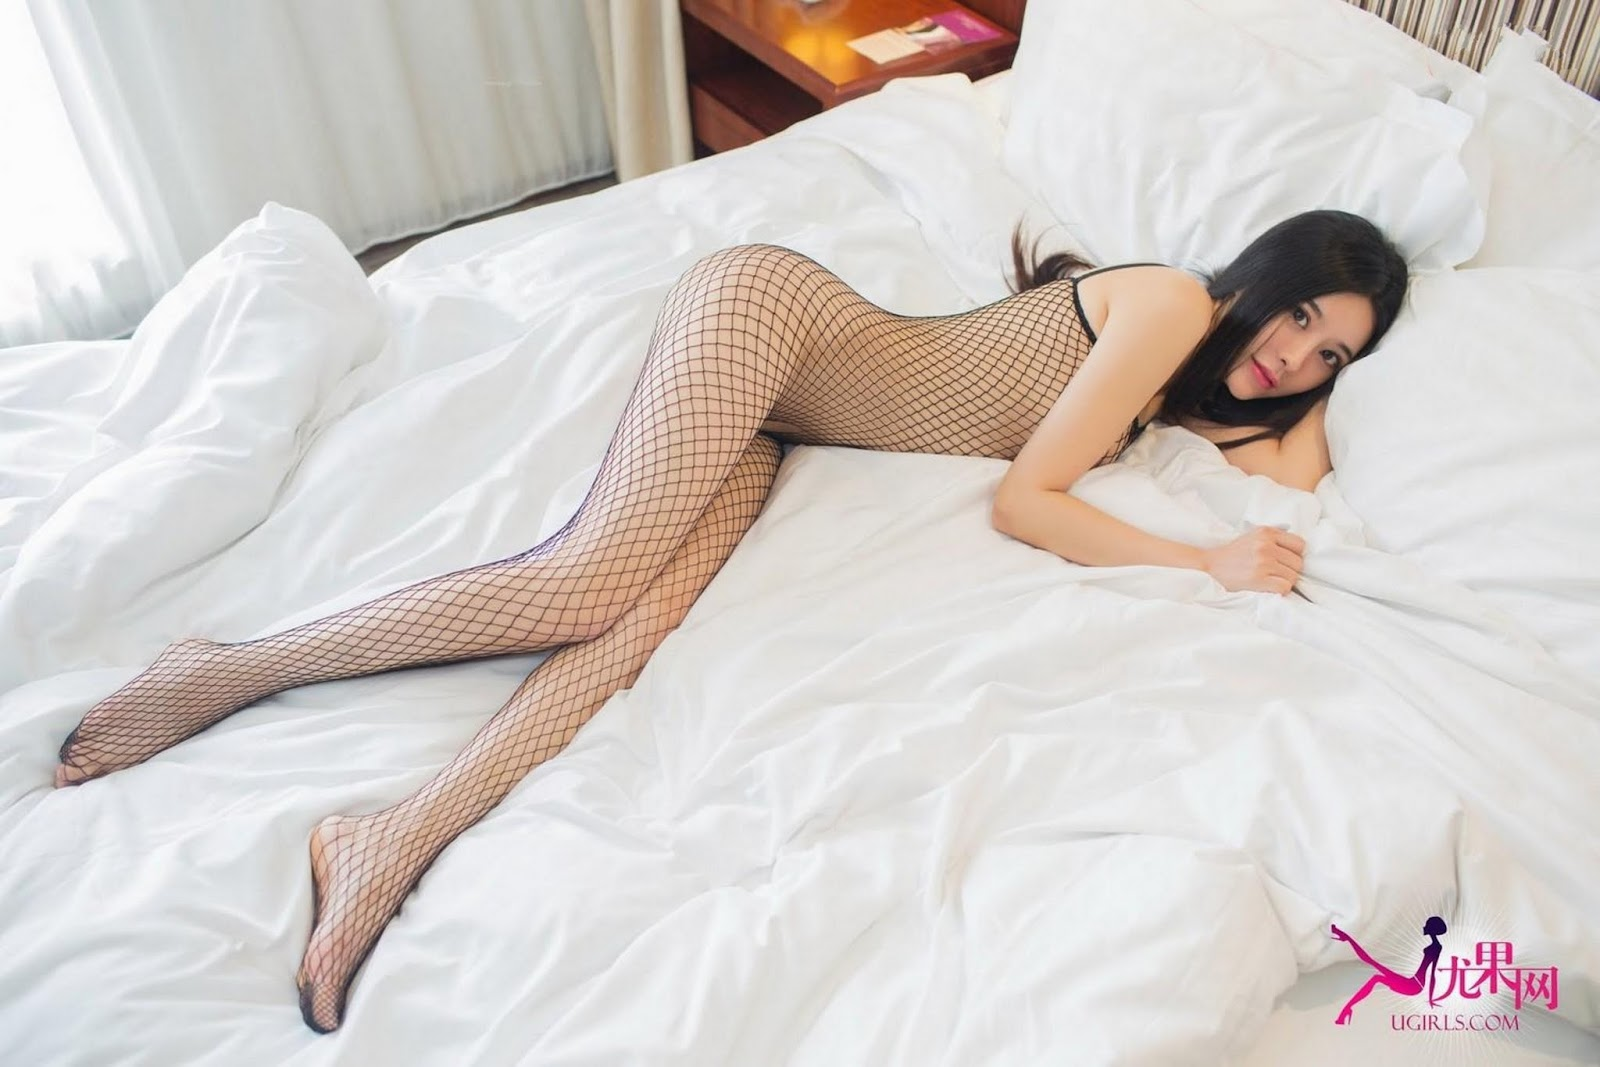 19 - Sexy Photo UGIRLS NO.103 Nude Girl